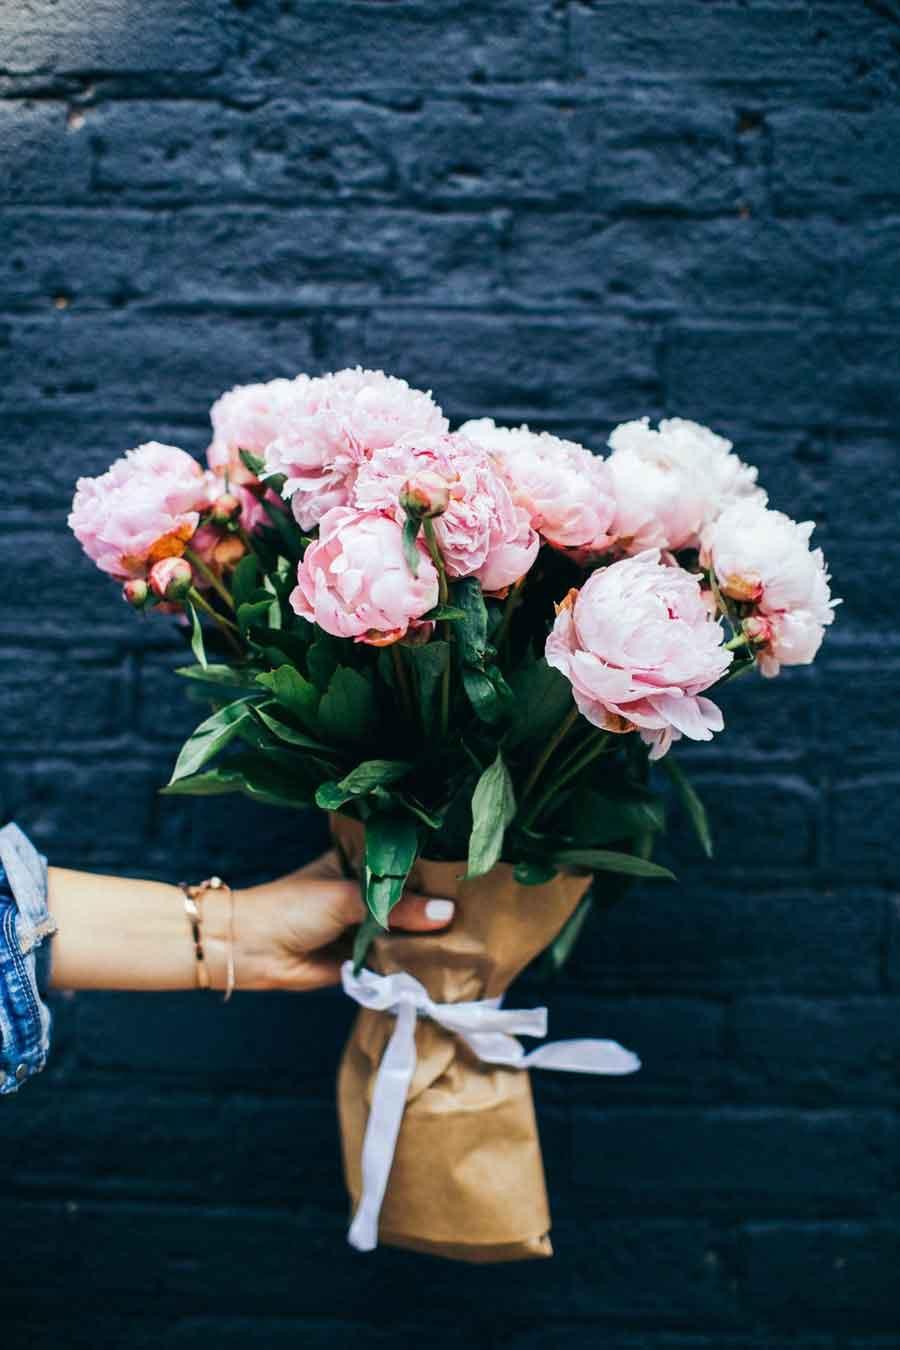 buy yourself flowers